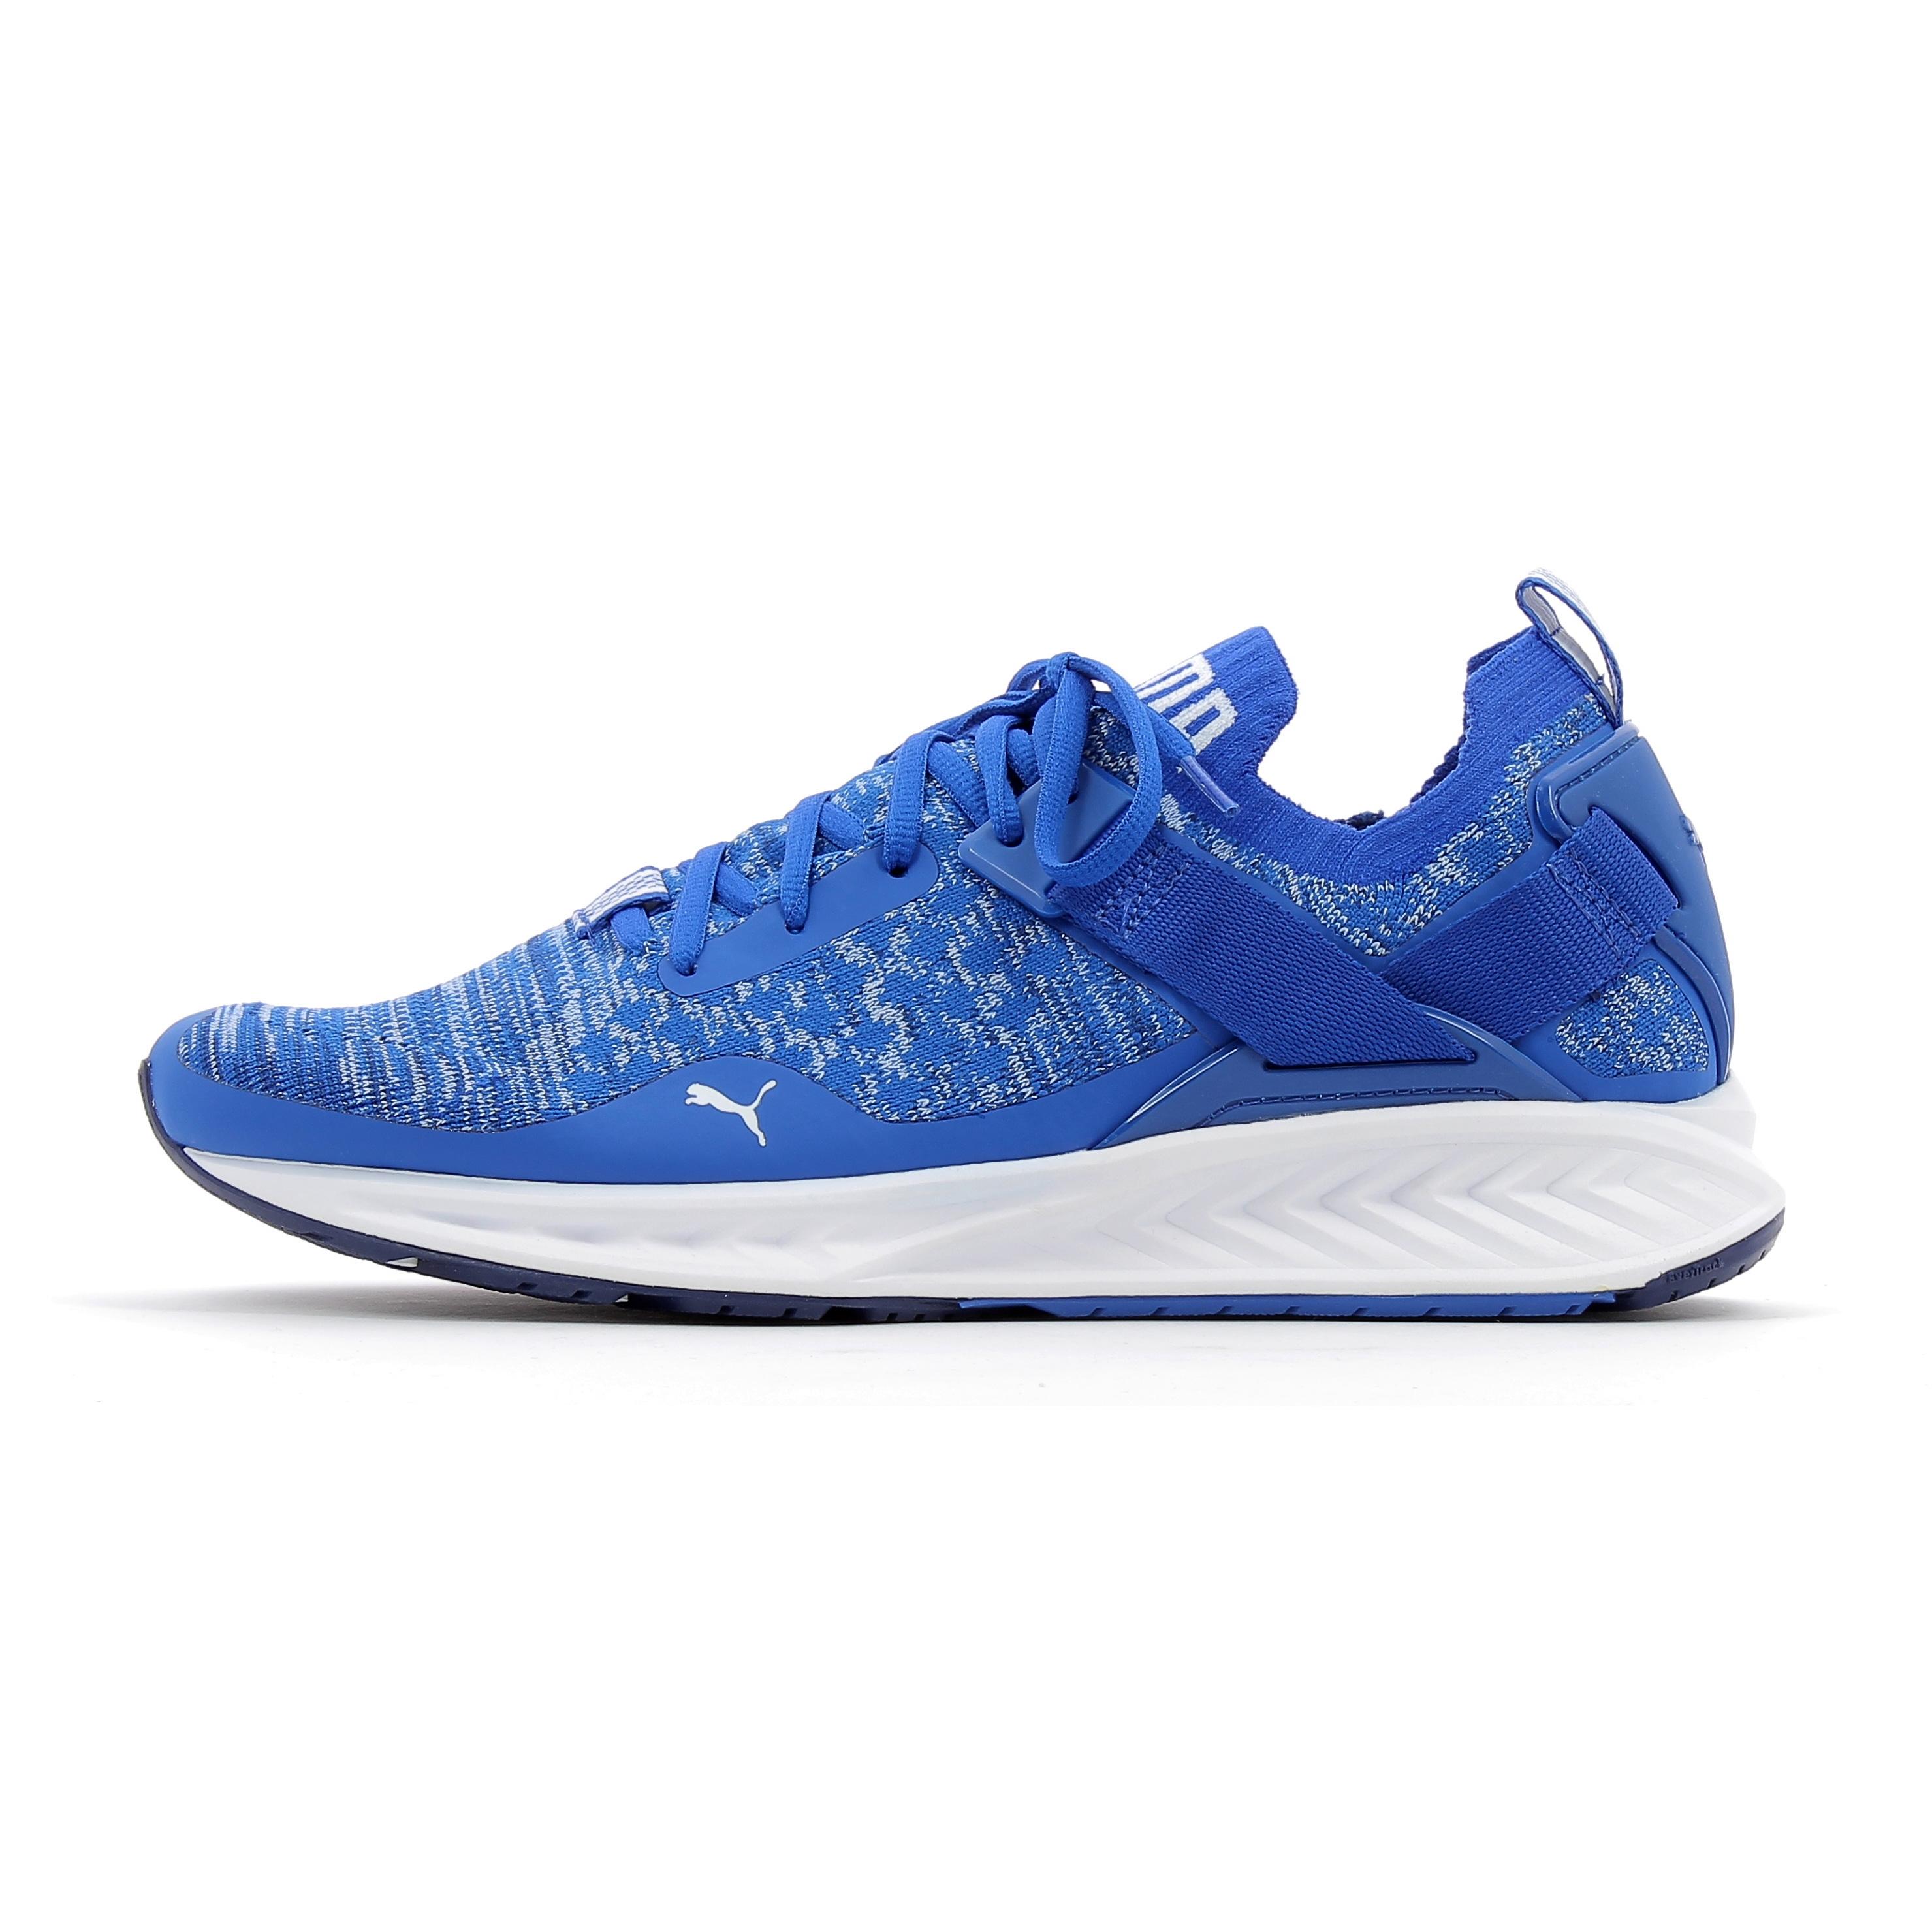 Chaussures de running Puma IGNITE EvoKnit Lo